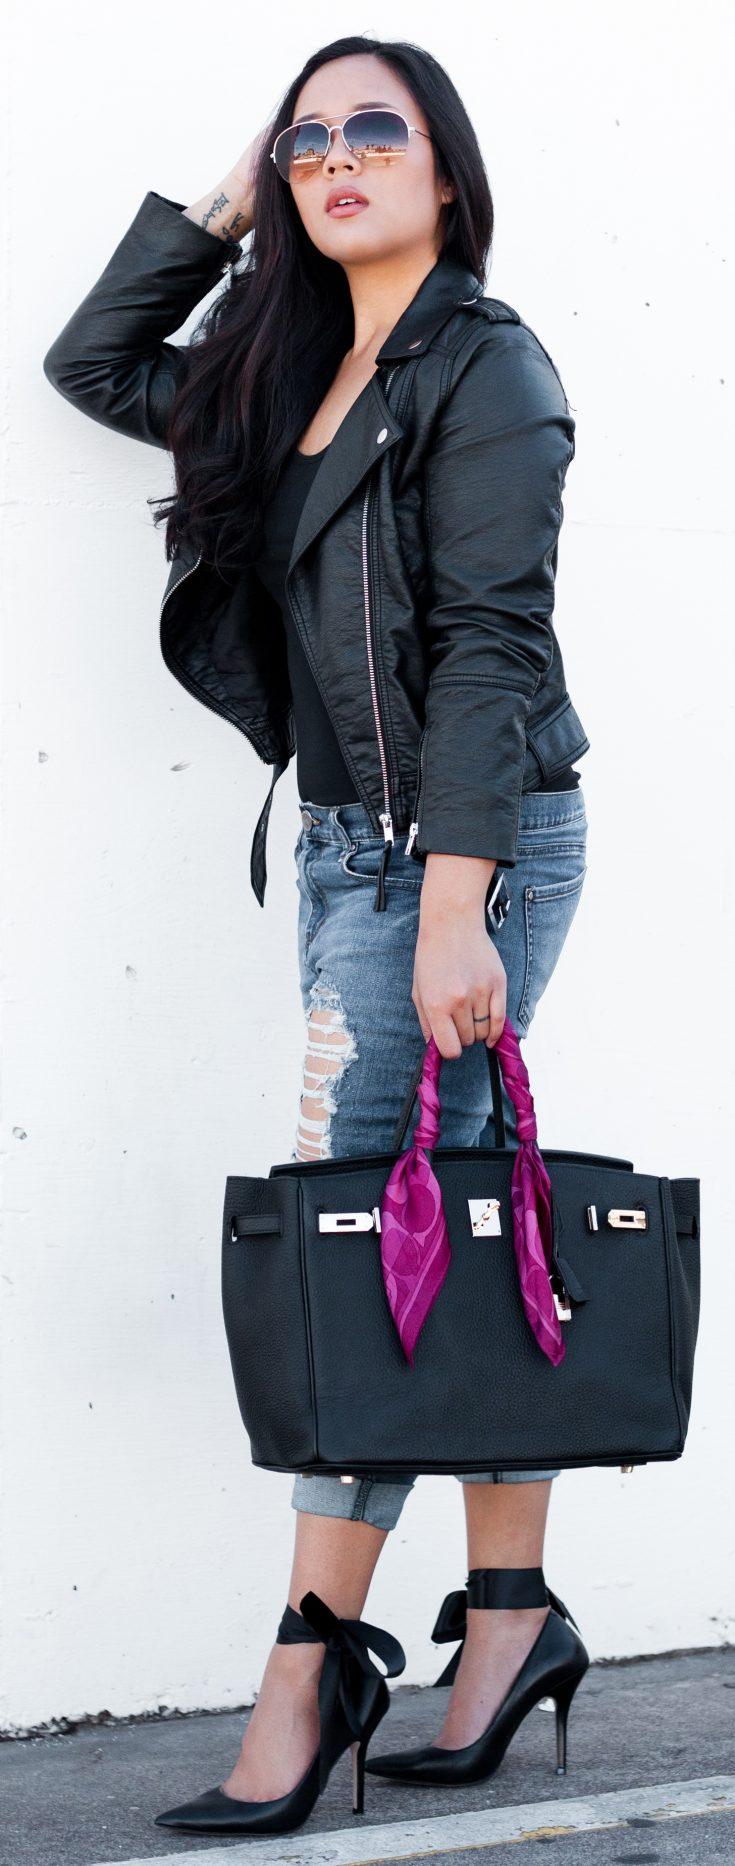 Shop the look: Sunglasses: $6.99, Biker Jacket: $39.99, Longsleeve Top: $16.99, Distressed Jeans: $29.90, Heels: $63.16, Leather Handbag: $64.83 - www.theballeronabudget.com